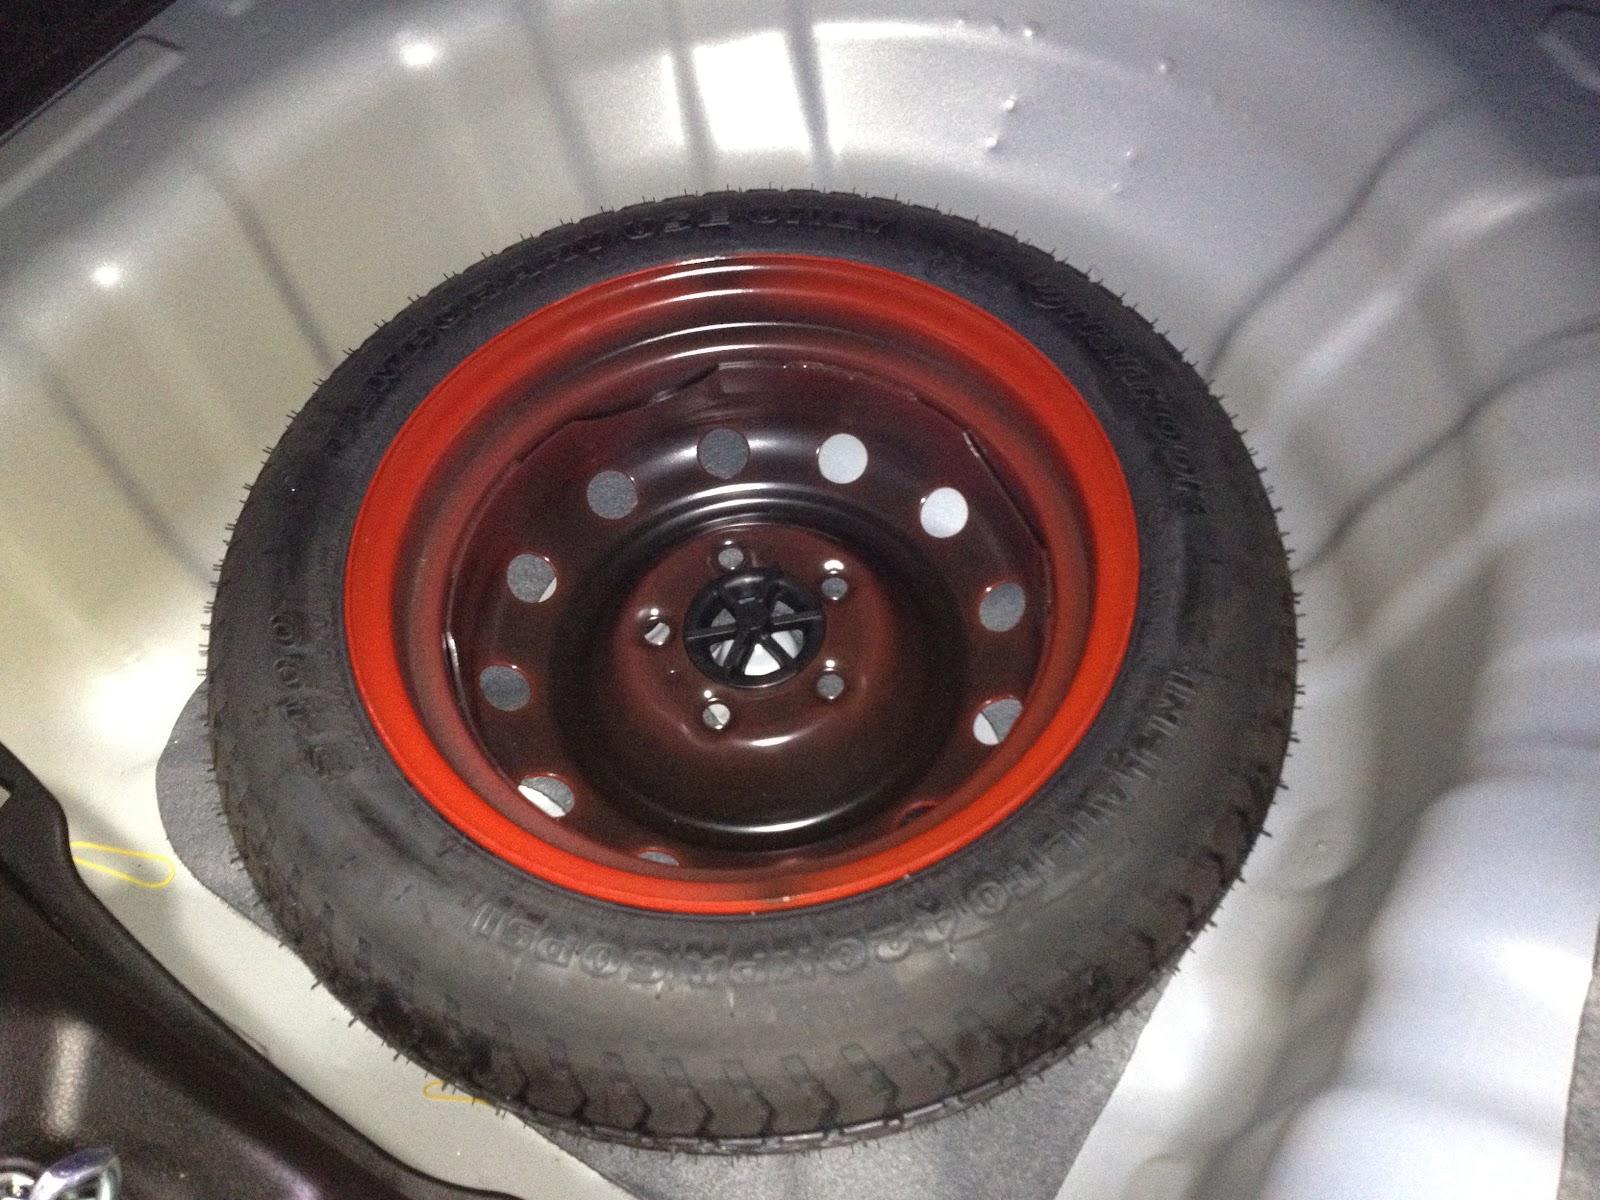 2012 Hyundai Elantra Tire Size >> The Hyundai Elantra - hello impossible? - kensomuse